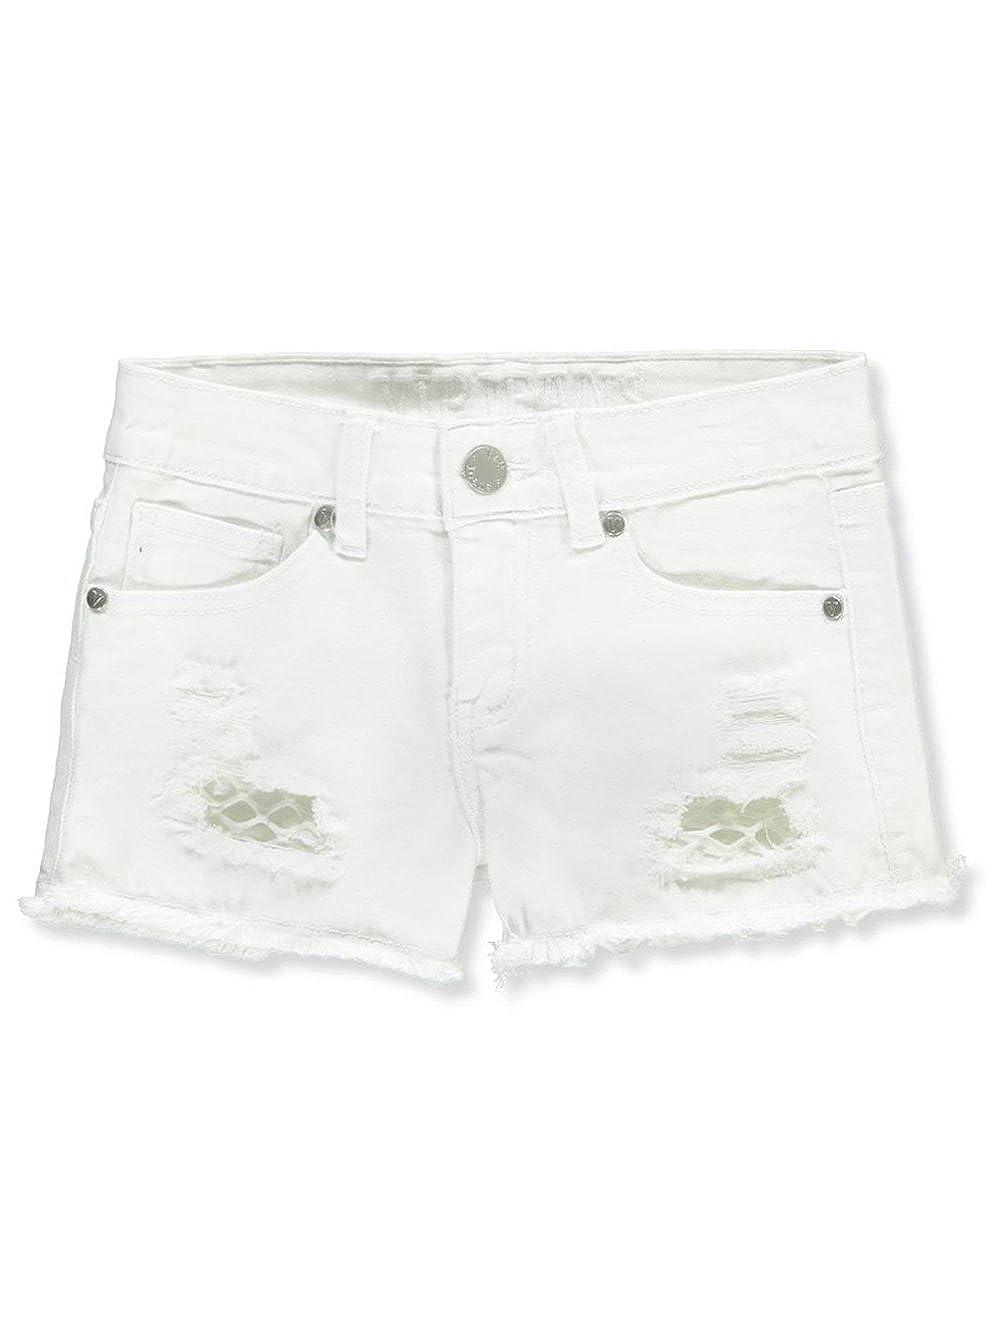 VIP Jeans Girls Shorts